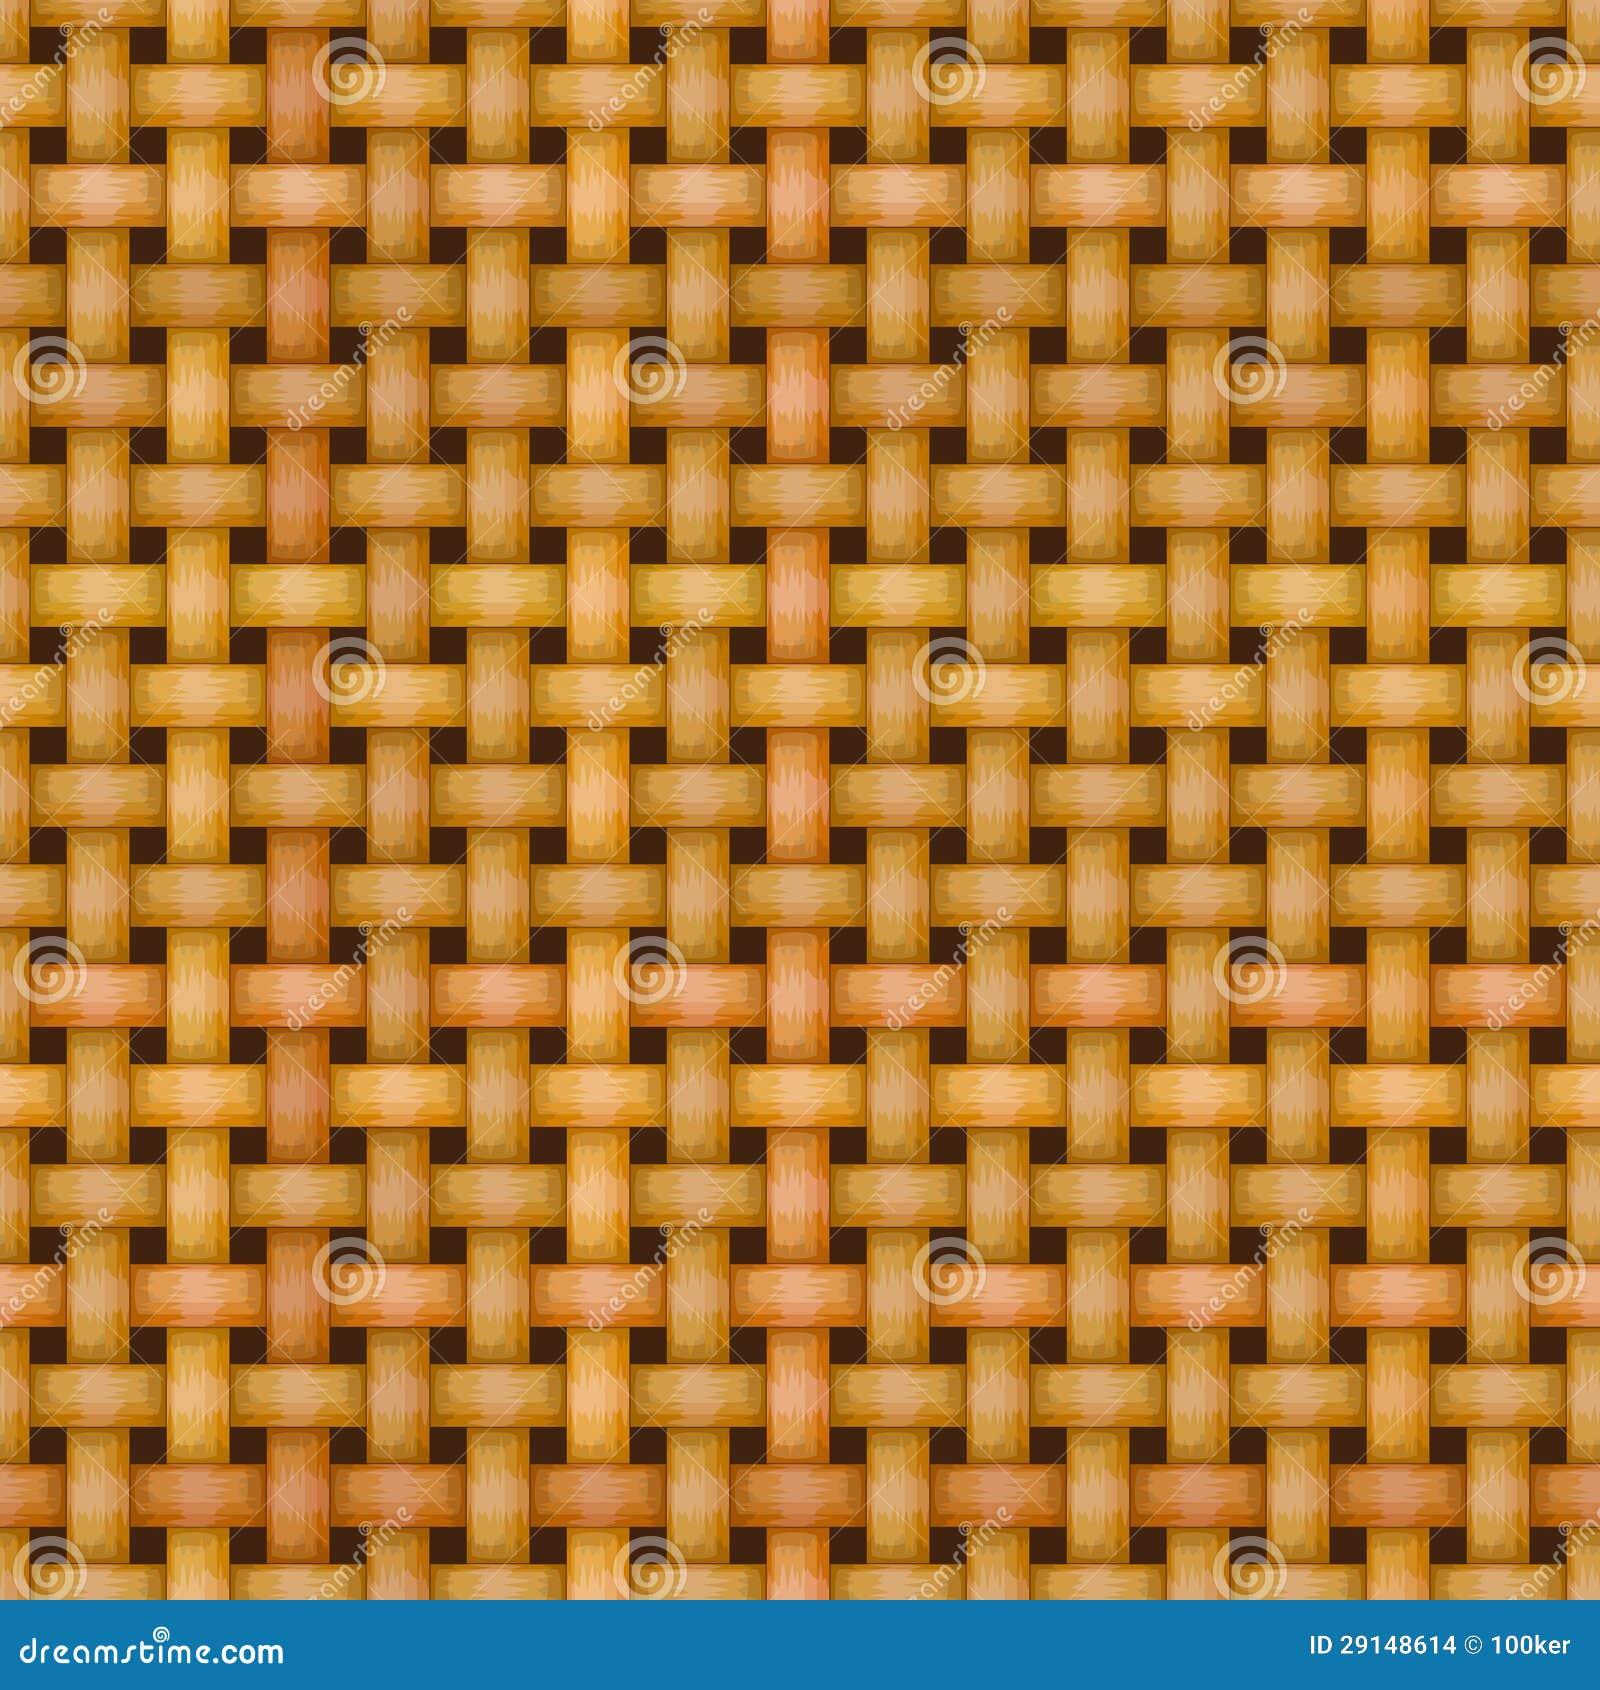 weave reed pattern - photo #23